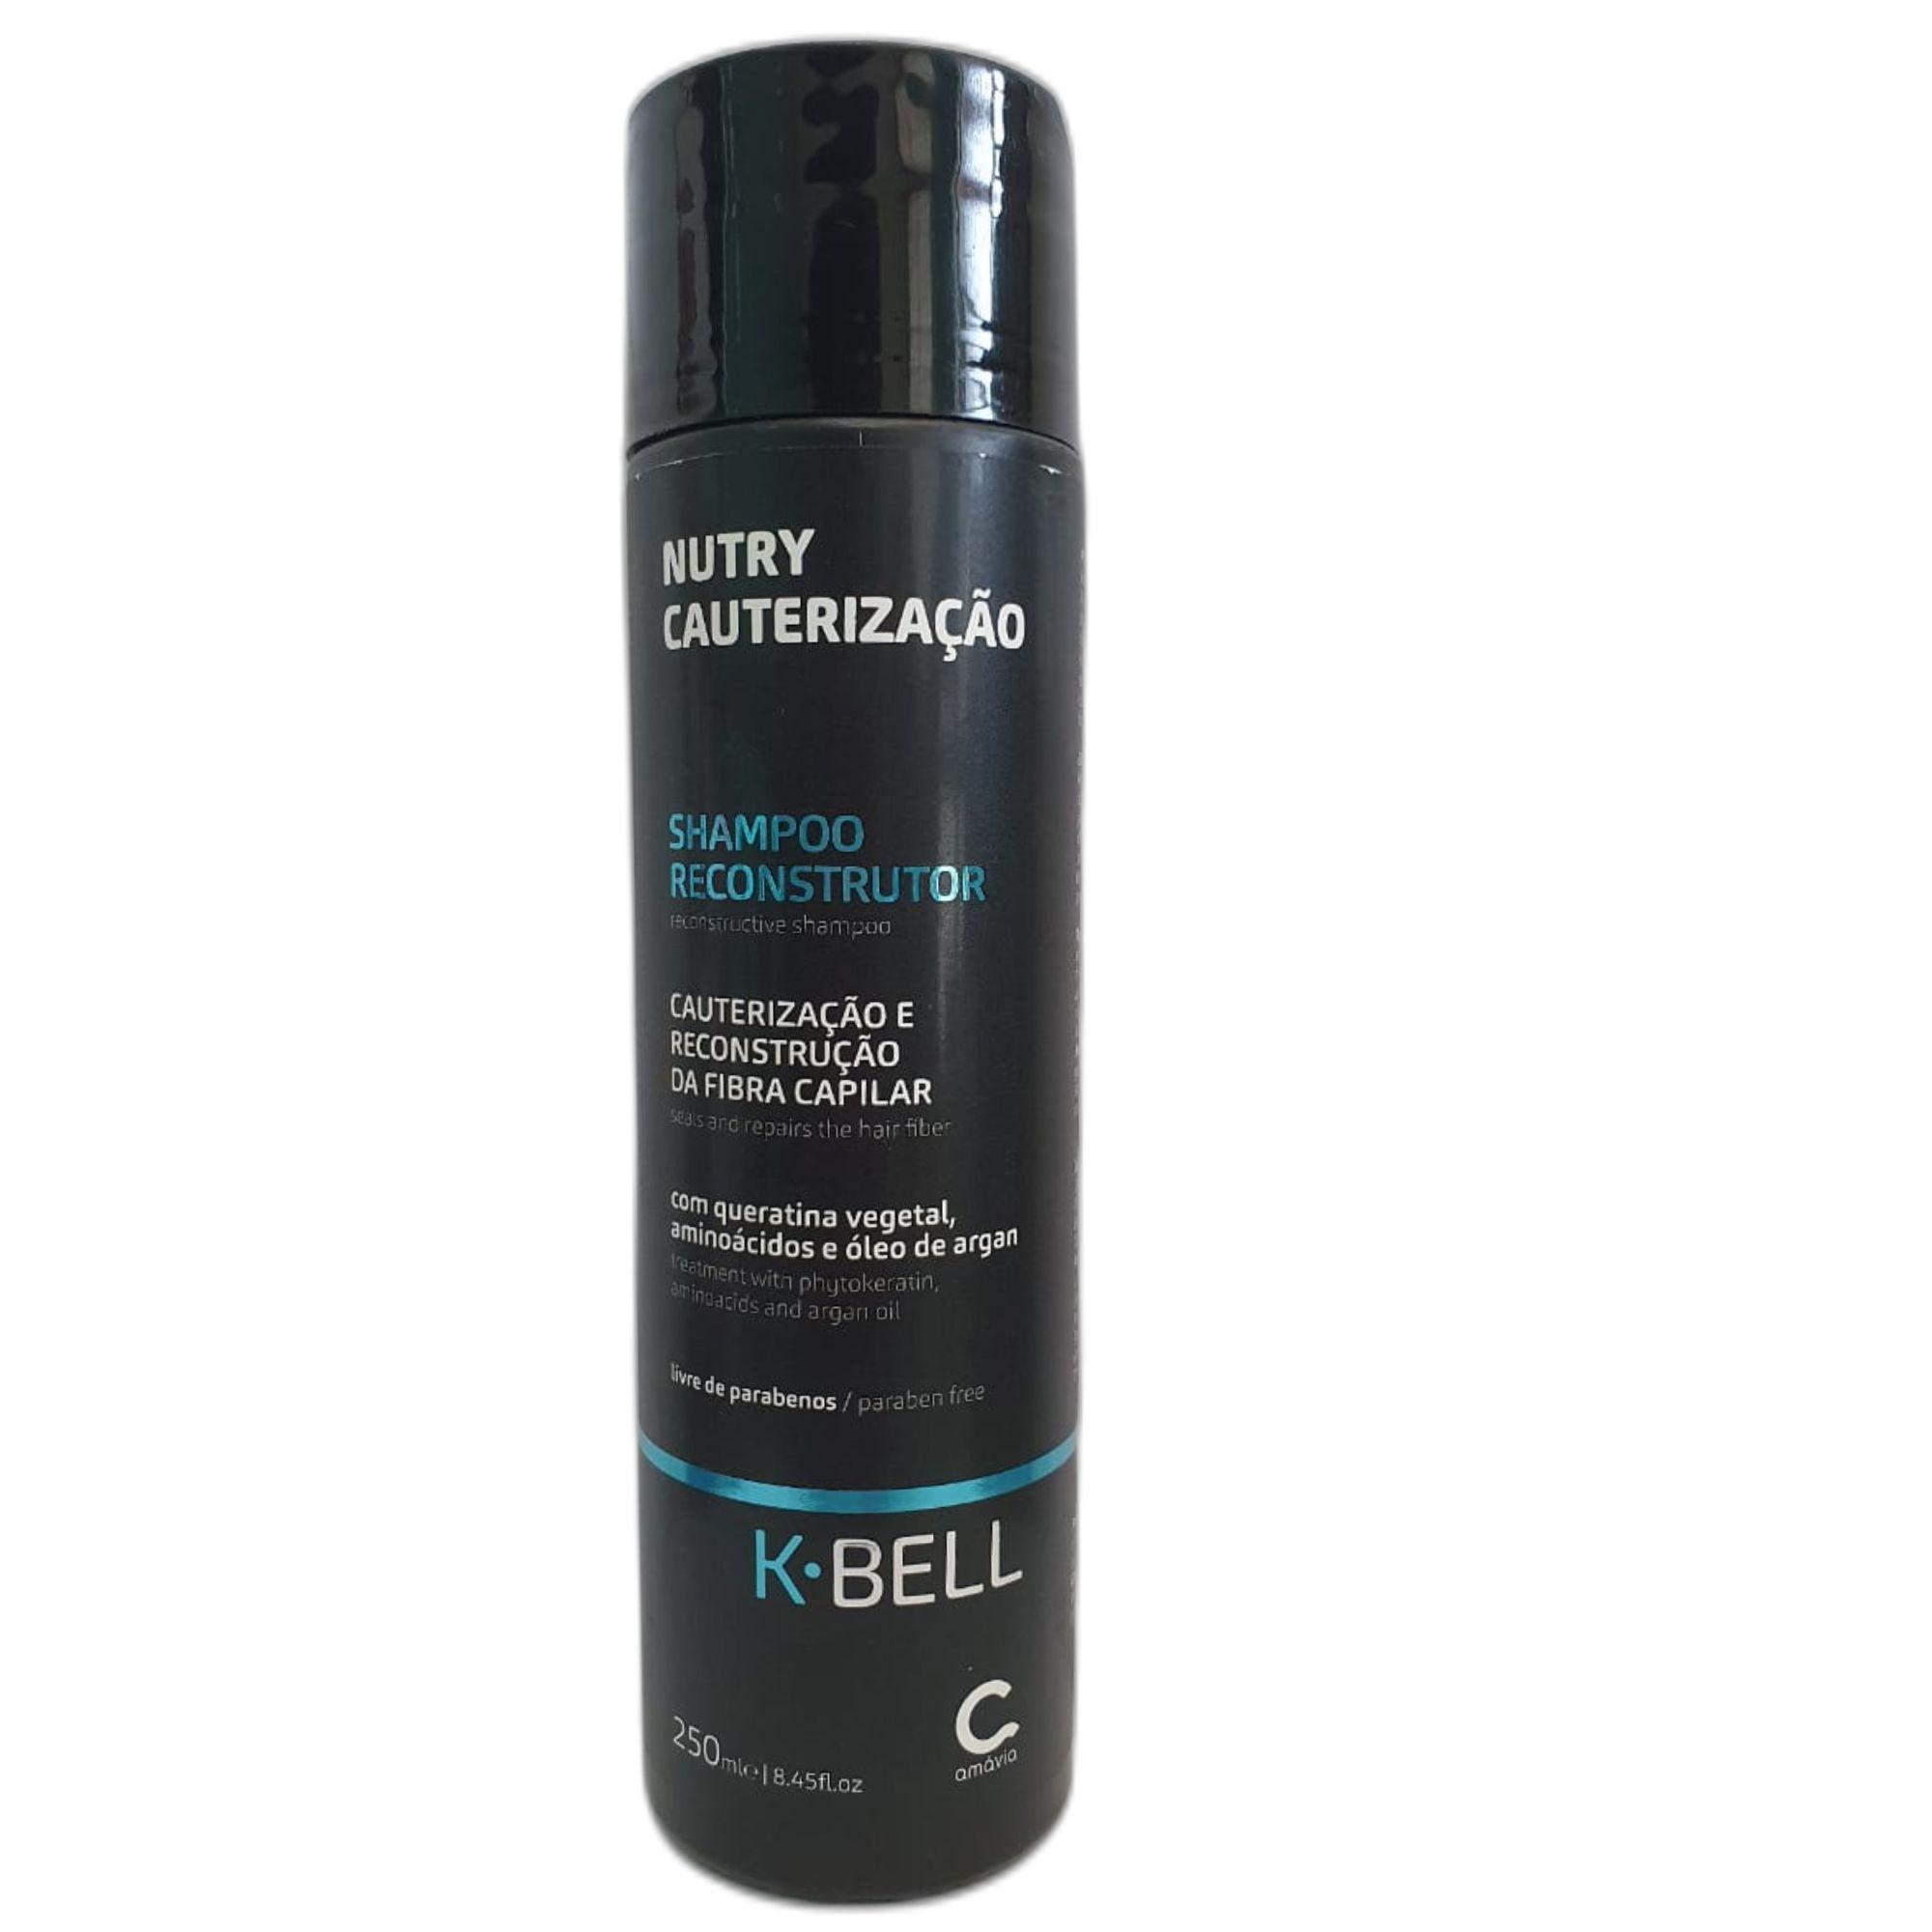 KBELL - Nutry Cauterização Shampoo 250ml